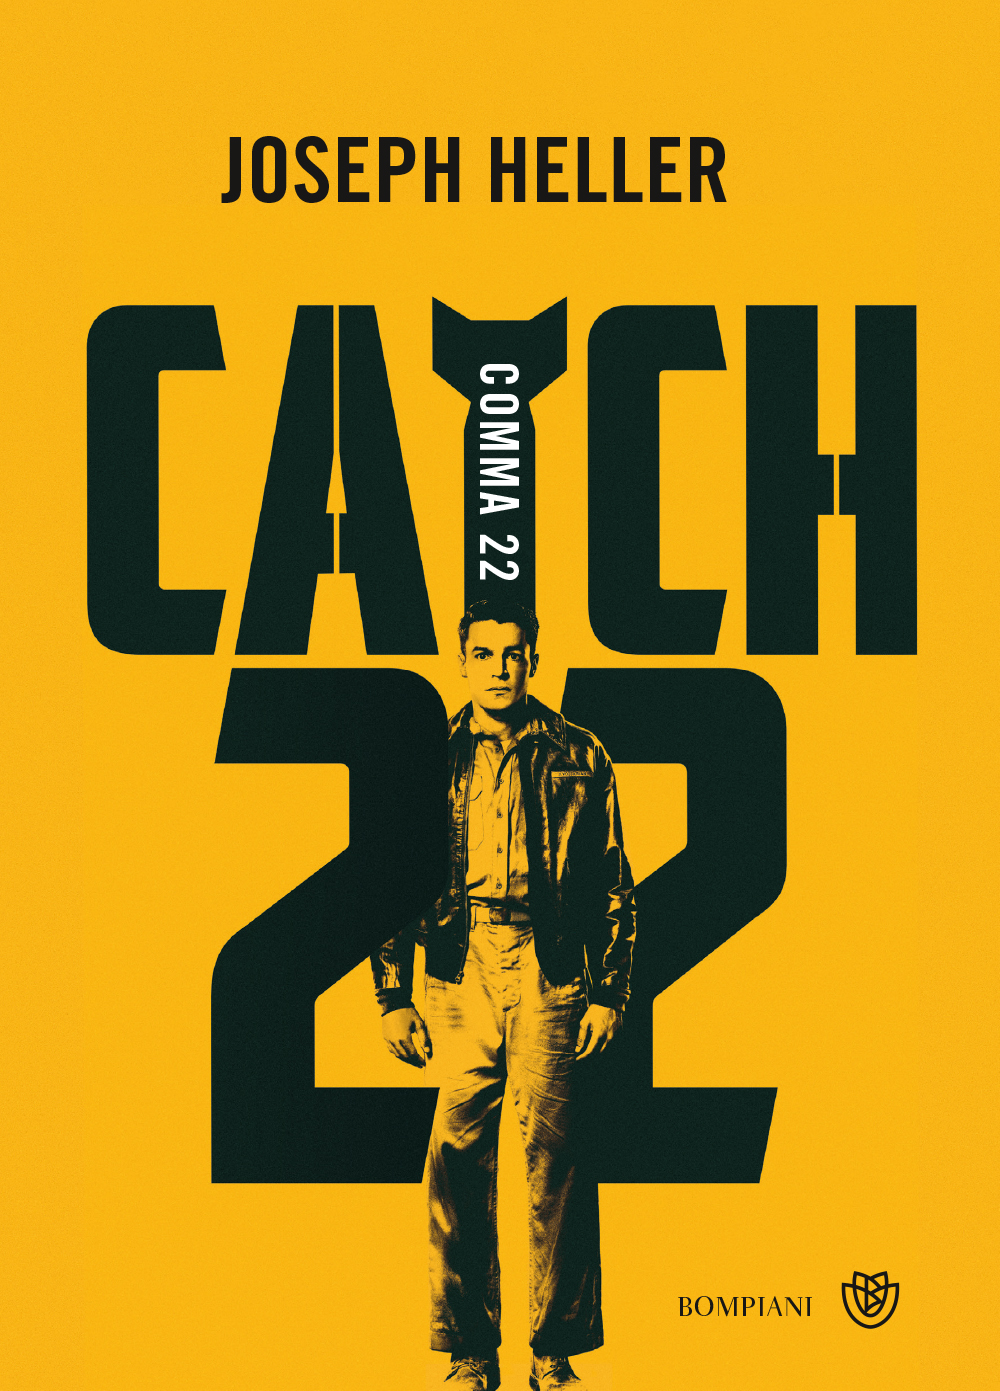 catch-22-comma-joseph-heller